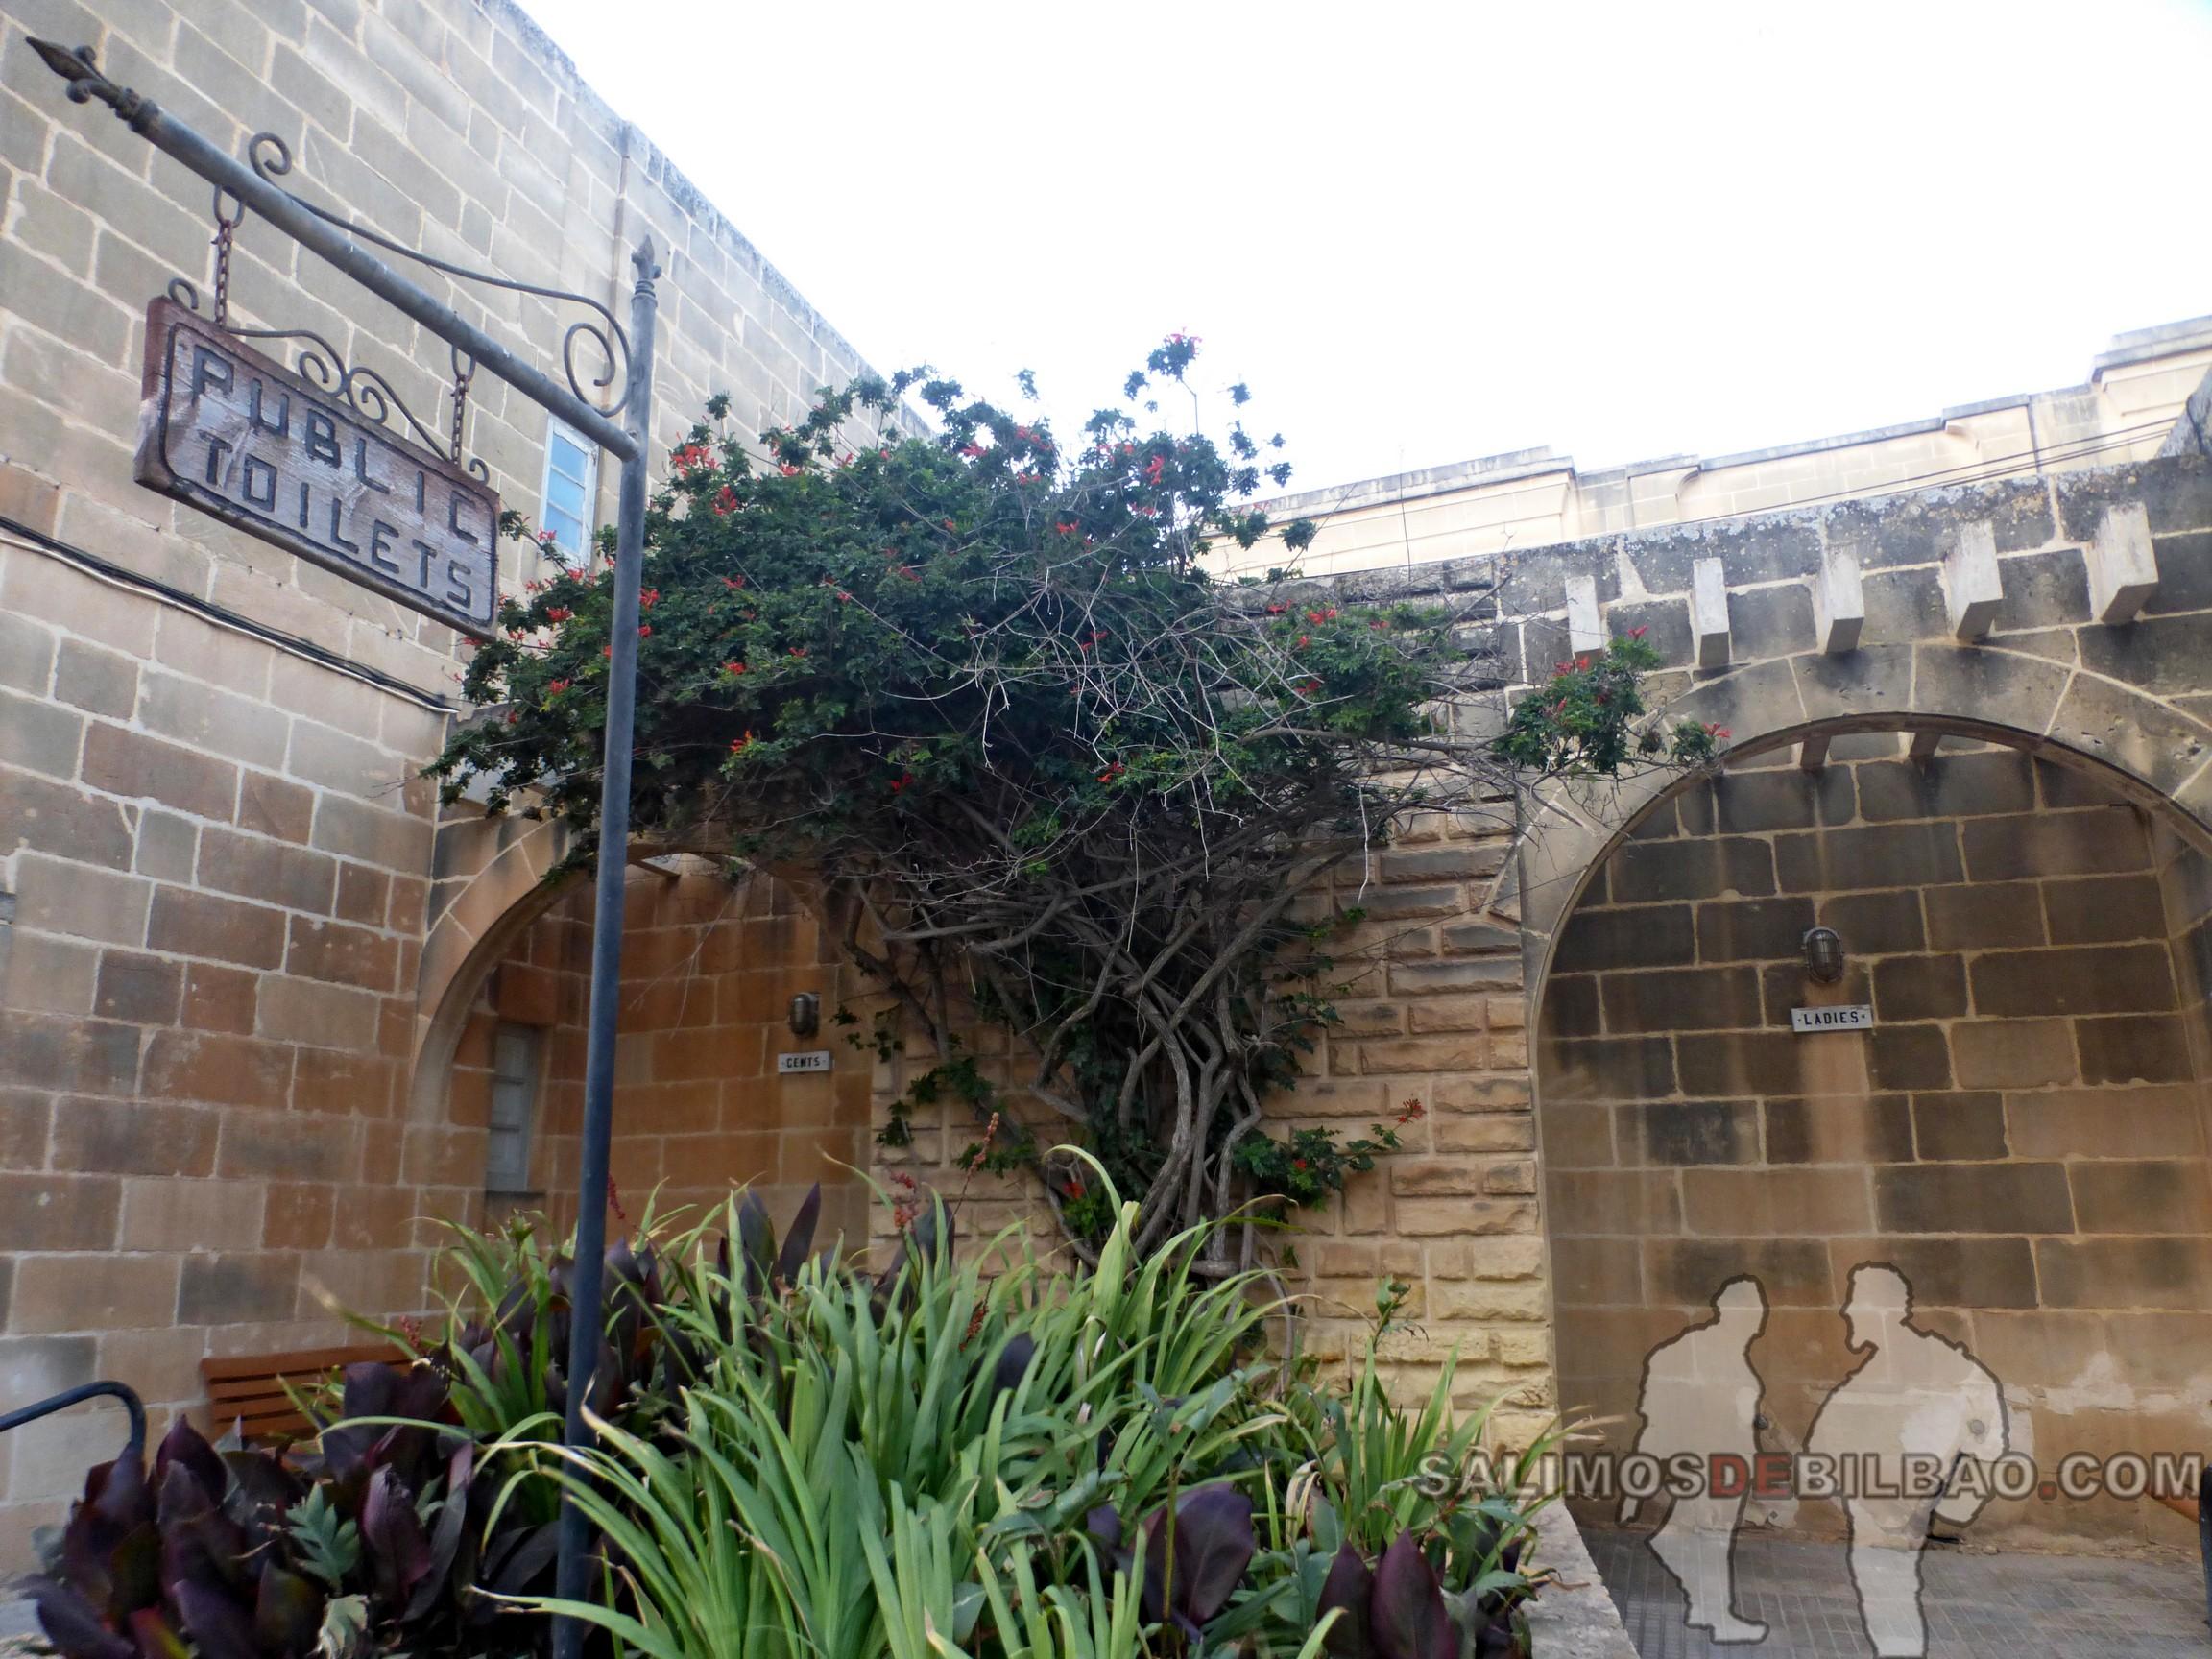 0461. Entrada a baños públicos, Xaghra, Gozo